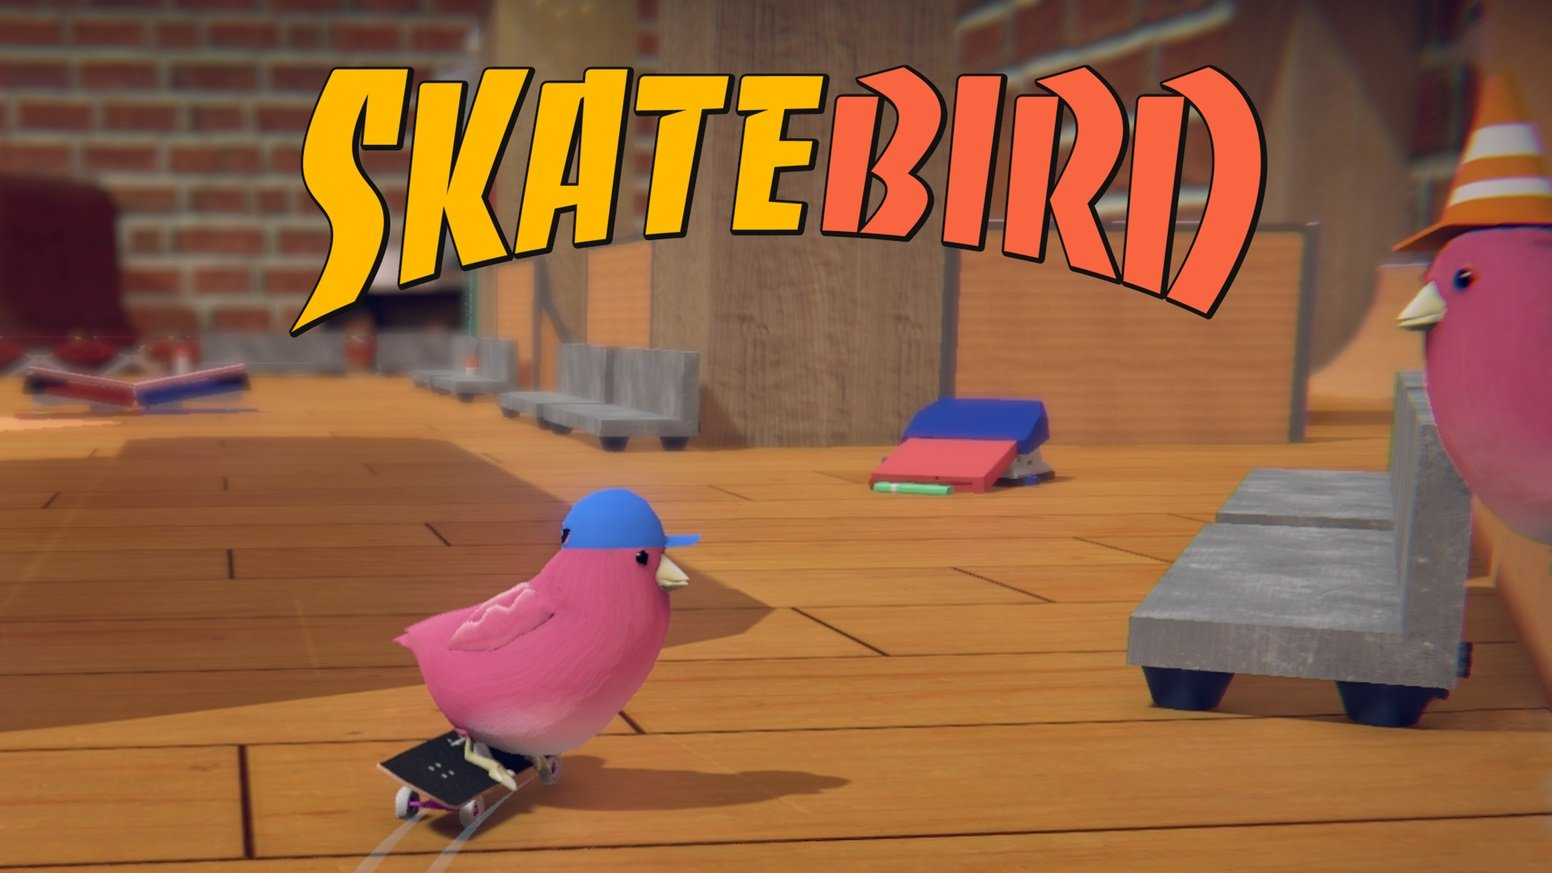 Get ready for SkateBIRD on Nintendo Switch in 2020